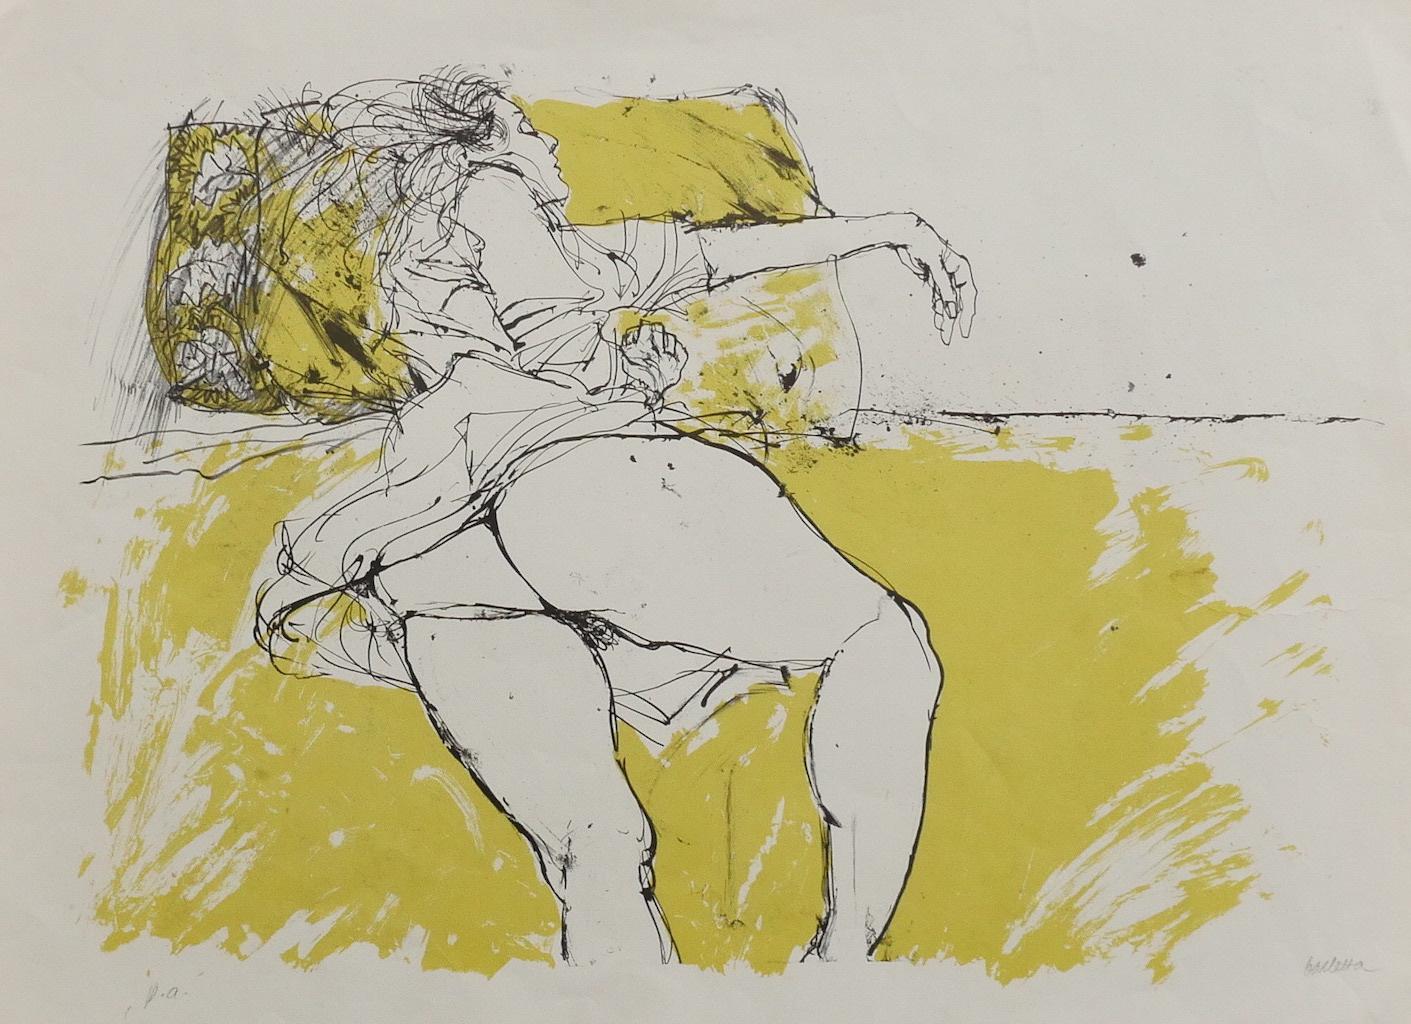 Nude - Original Lithography by Sergio Barletta - 1980s